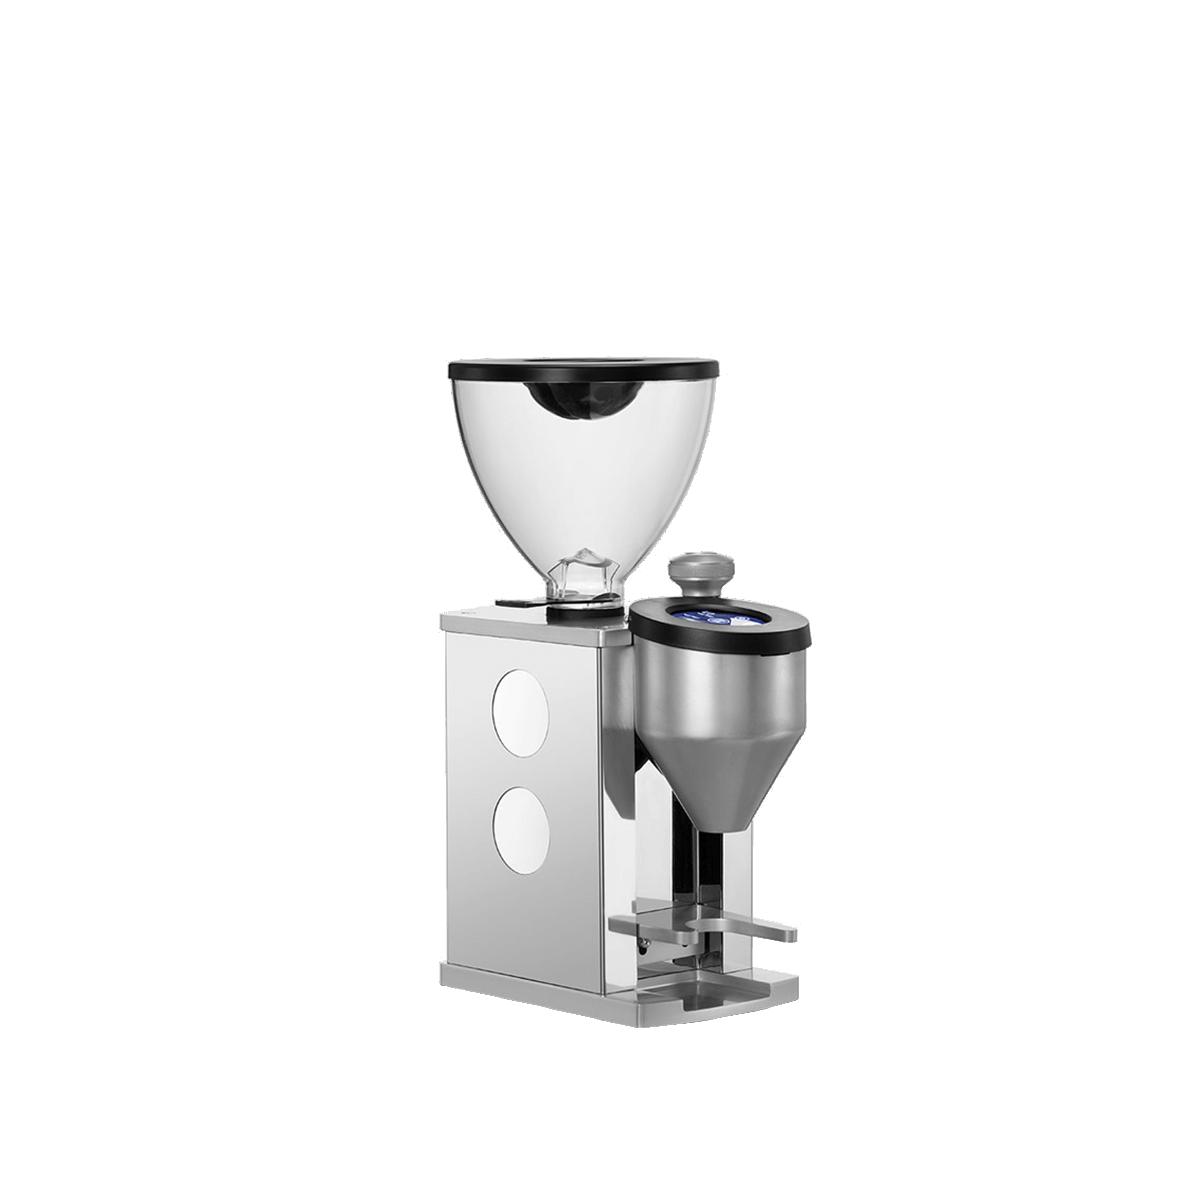 Coffee Grinder – Rocket Espresso Faustino Appartamento White